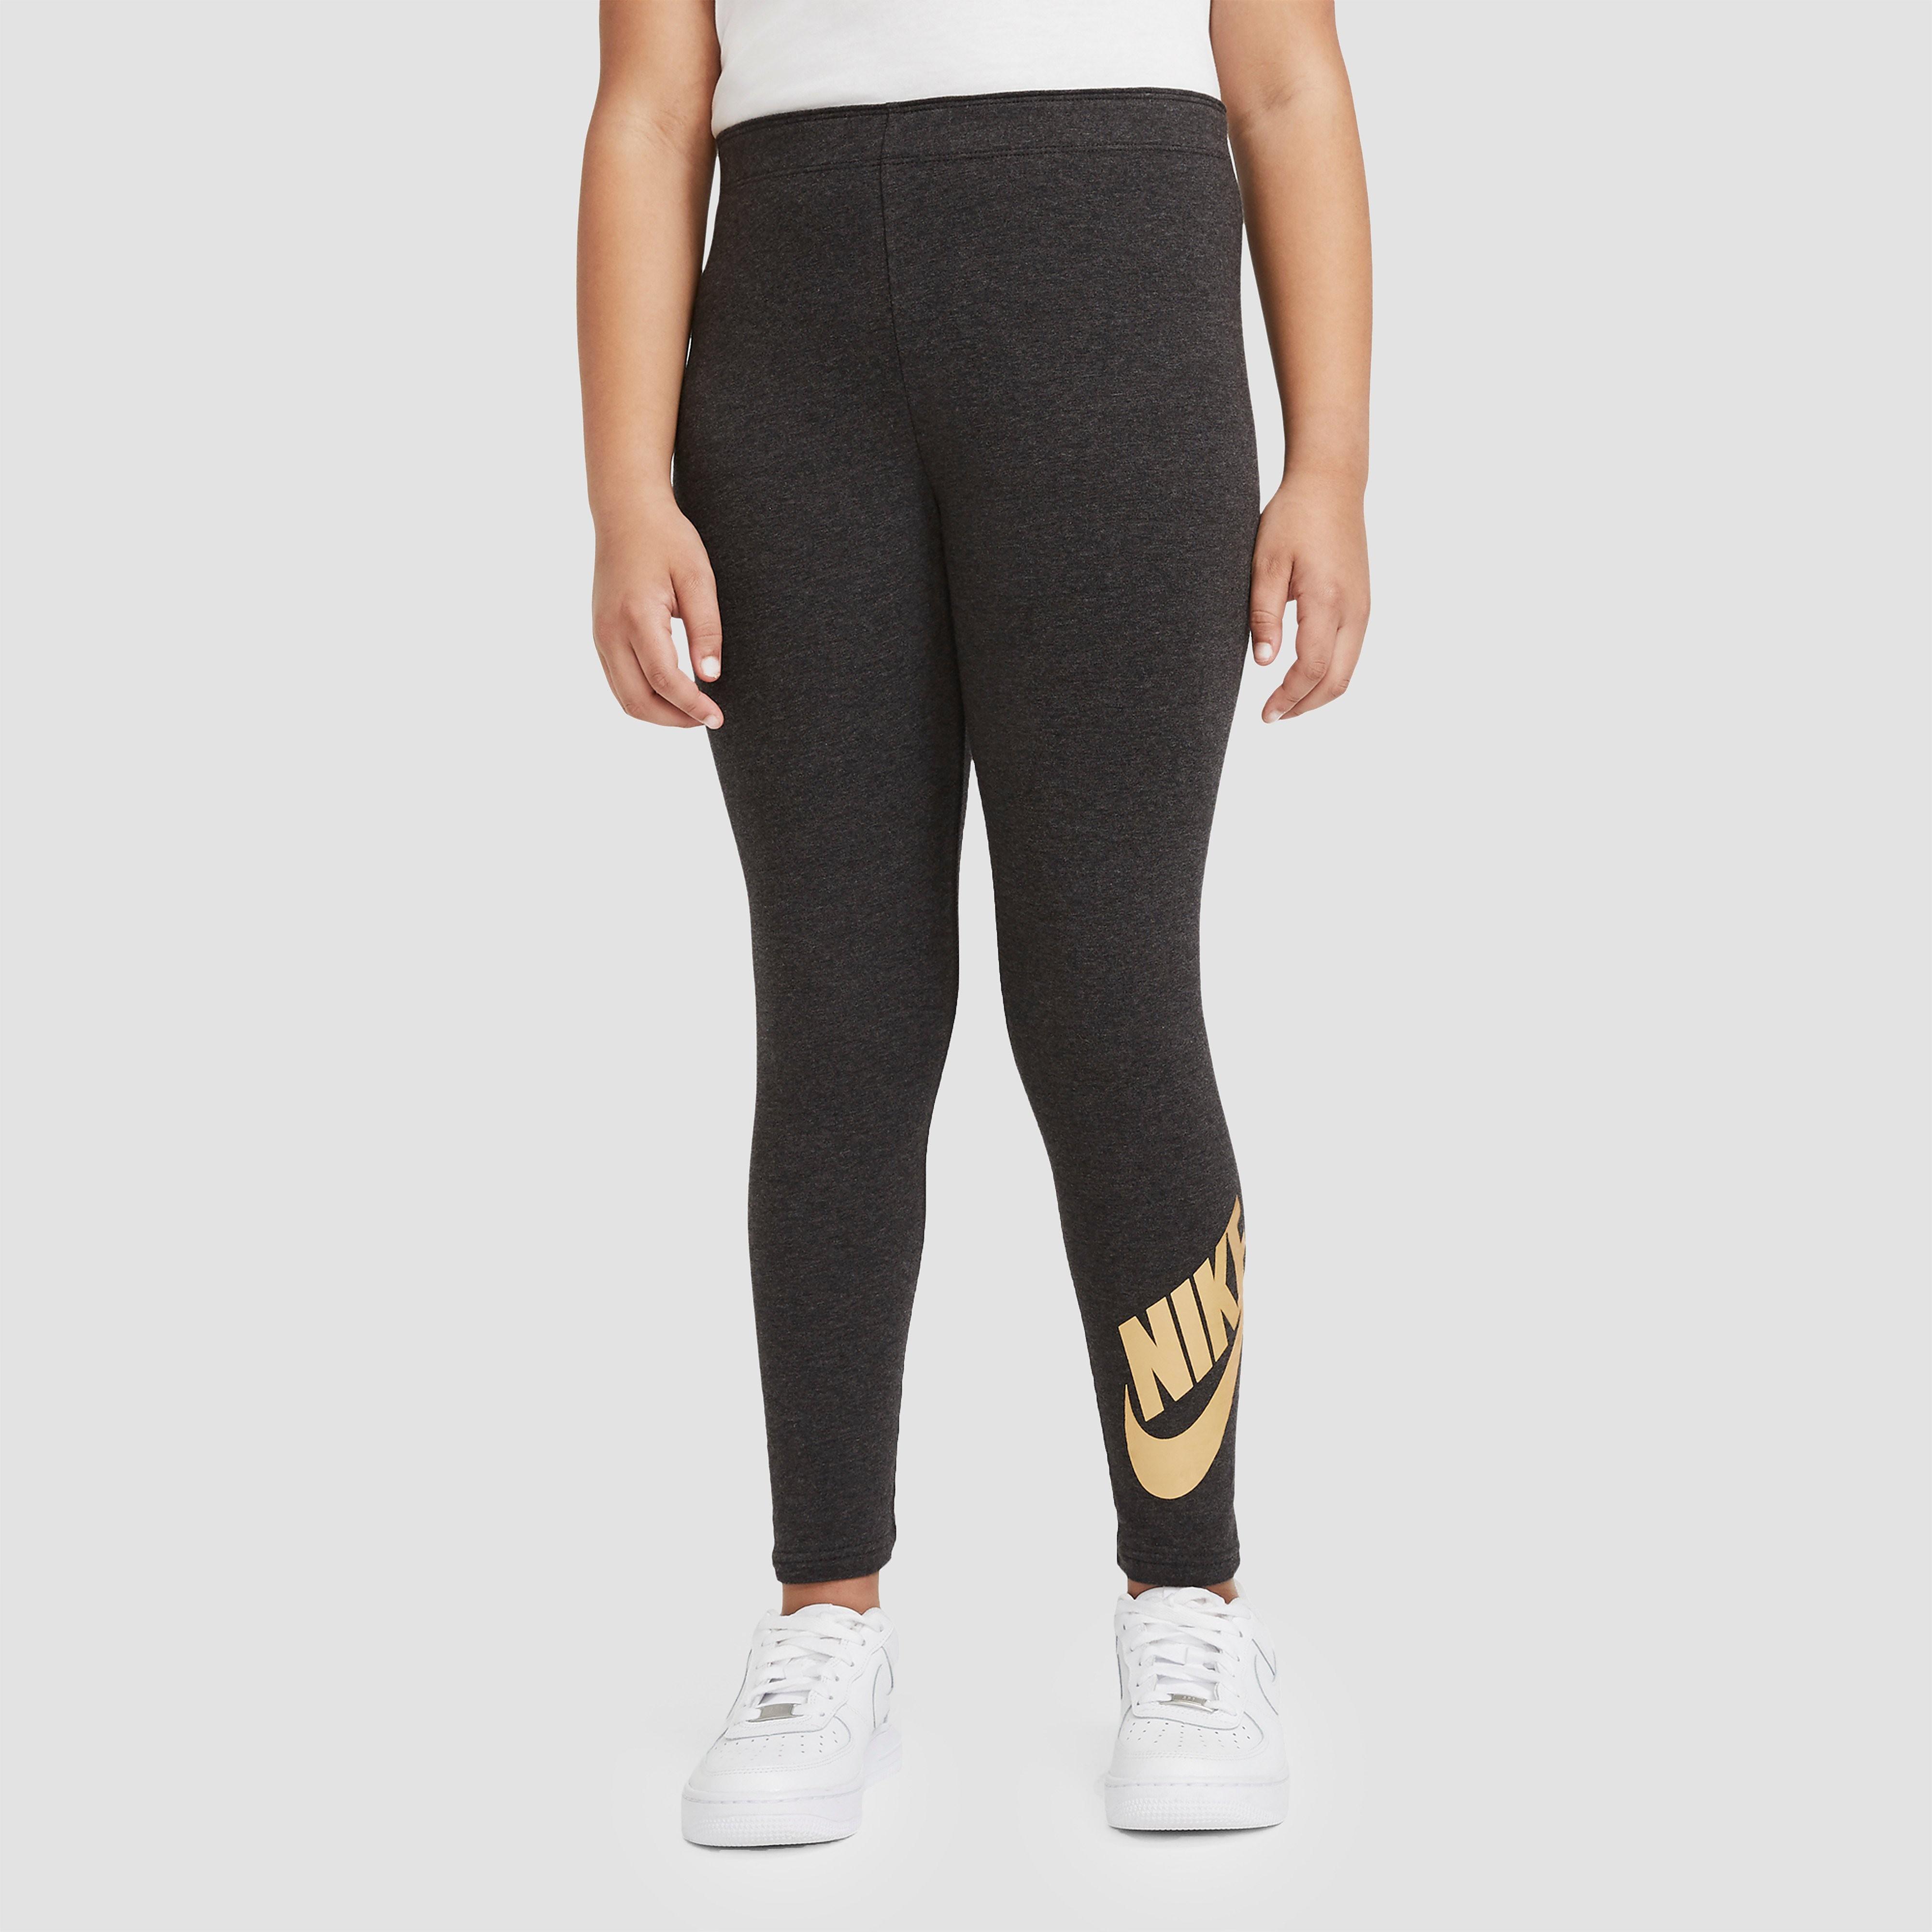 NIKE Sportswear graphic legging zwart/goud kinderen Kinderen